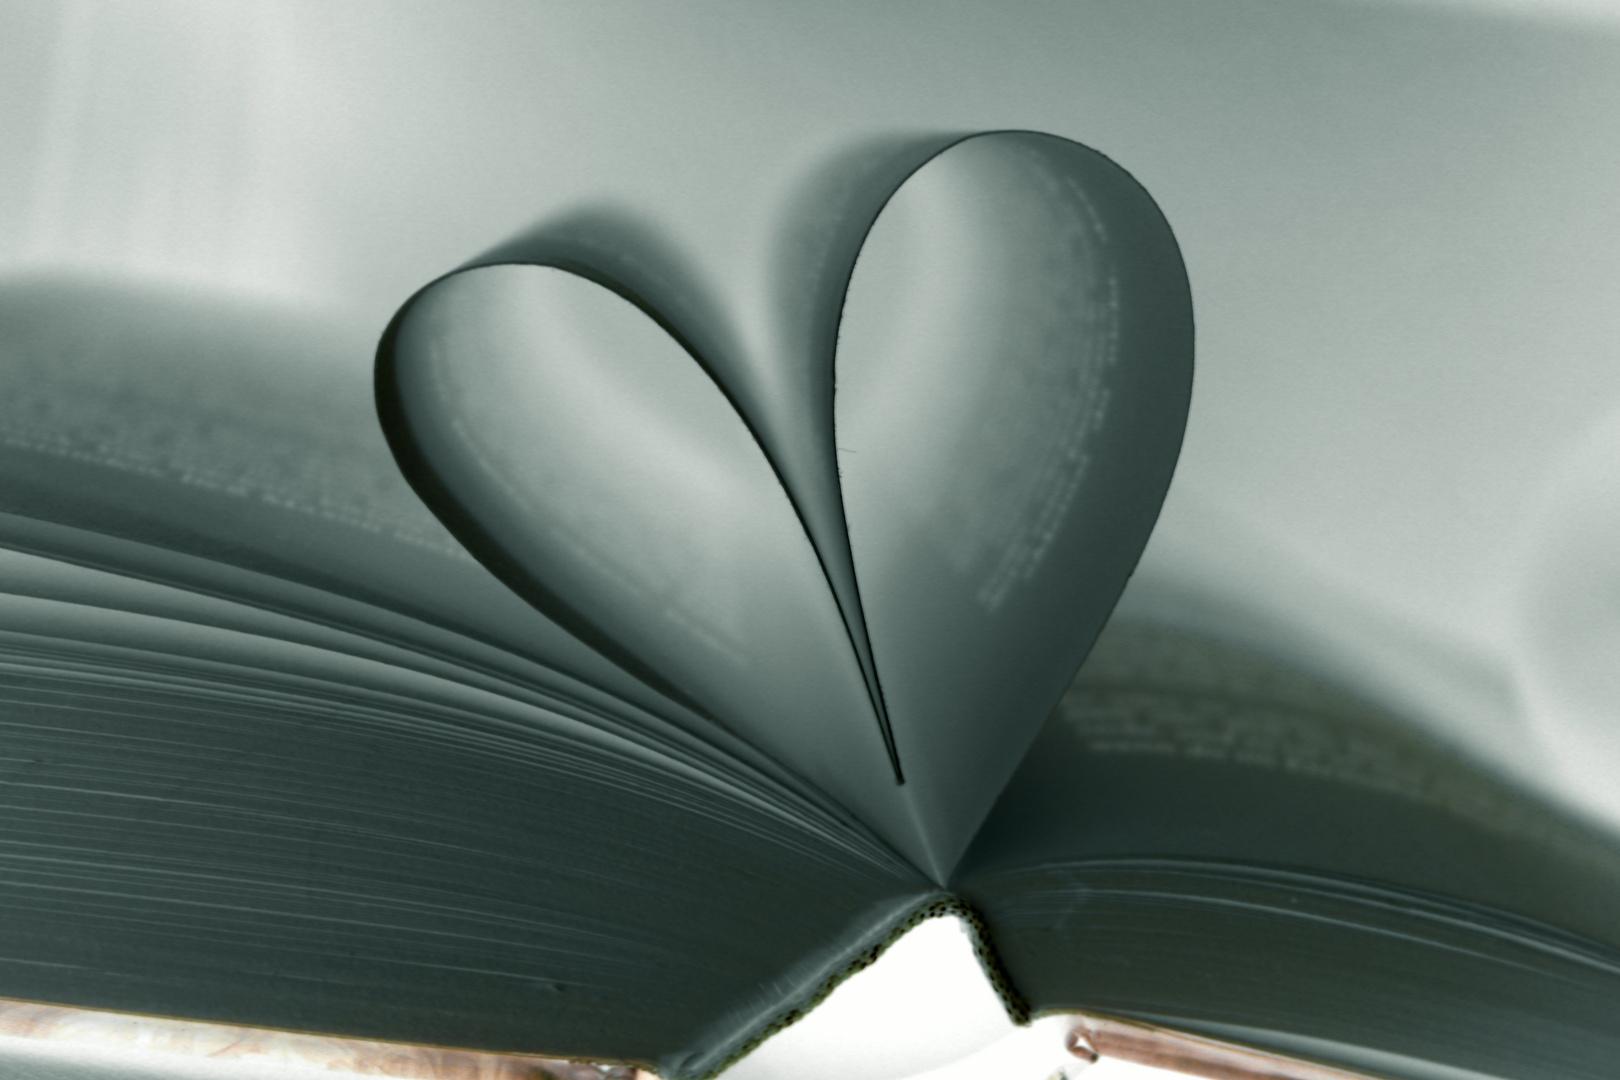 Buchherz fotografiert mit den Smart Filter Negativ / Paper Heart photographed with the SmartFilter n